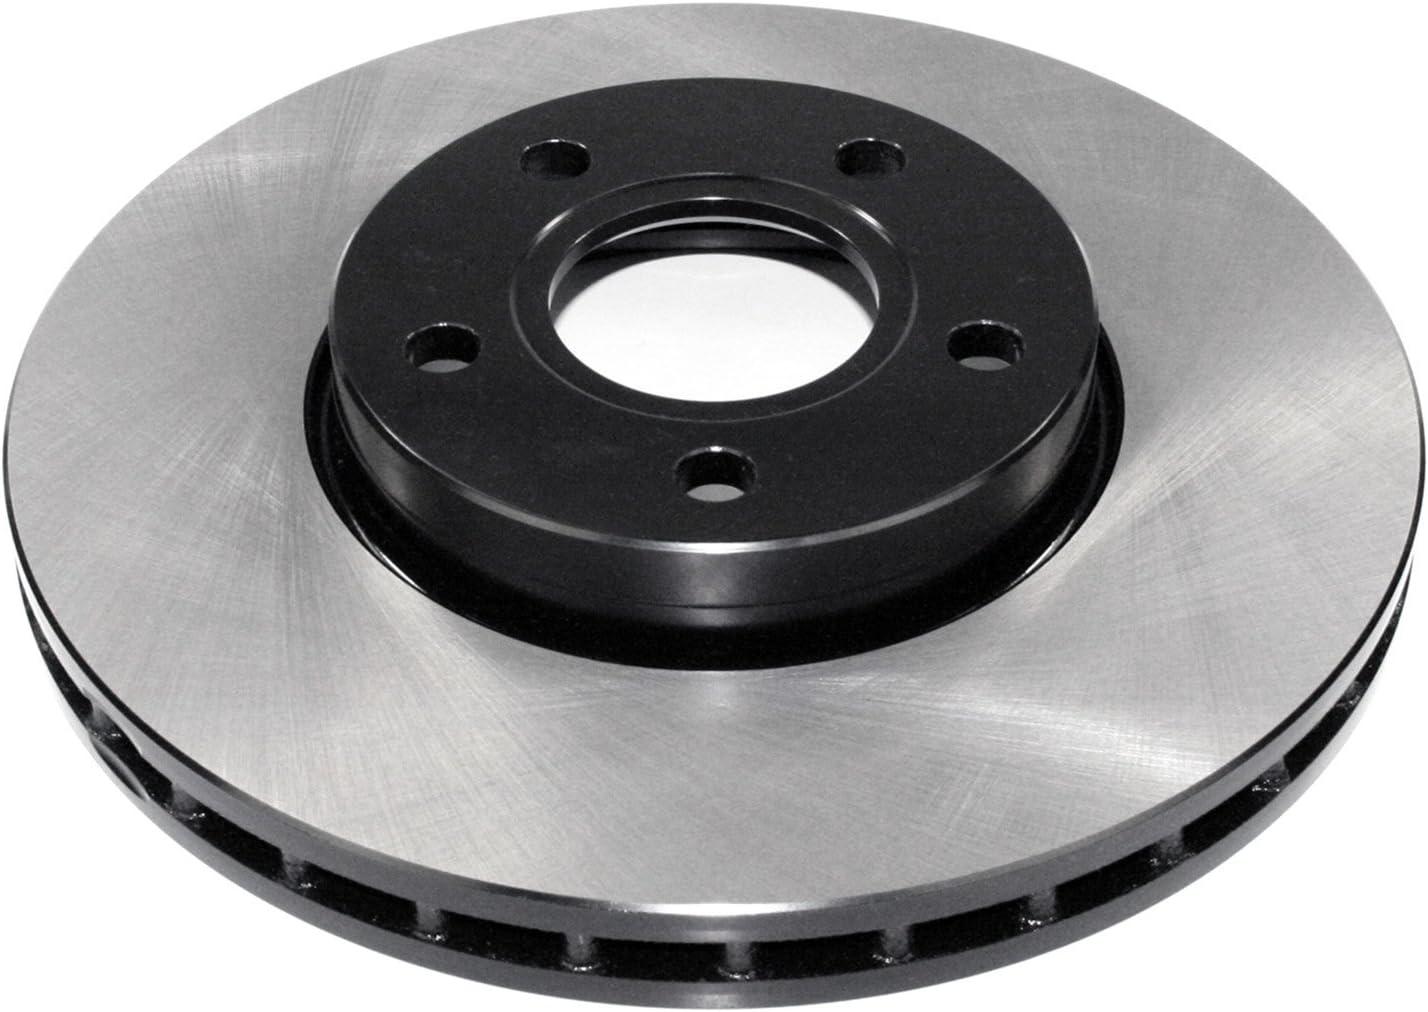 <strong>DuraGo Premium Electrophoretic Brake Rotor</strong>